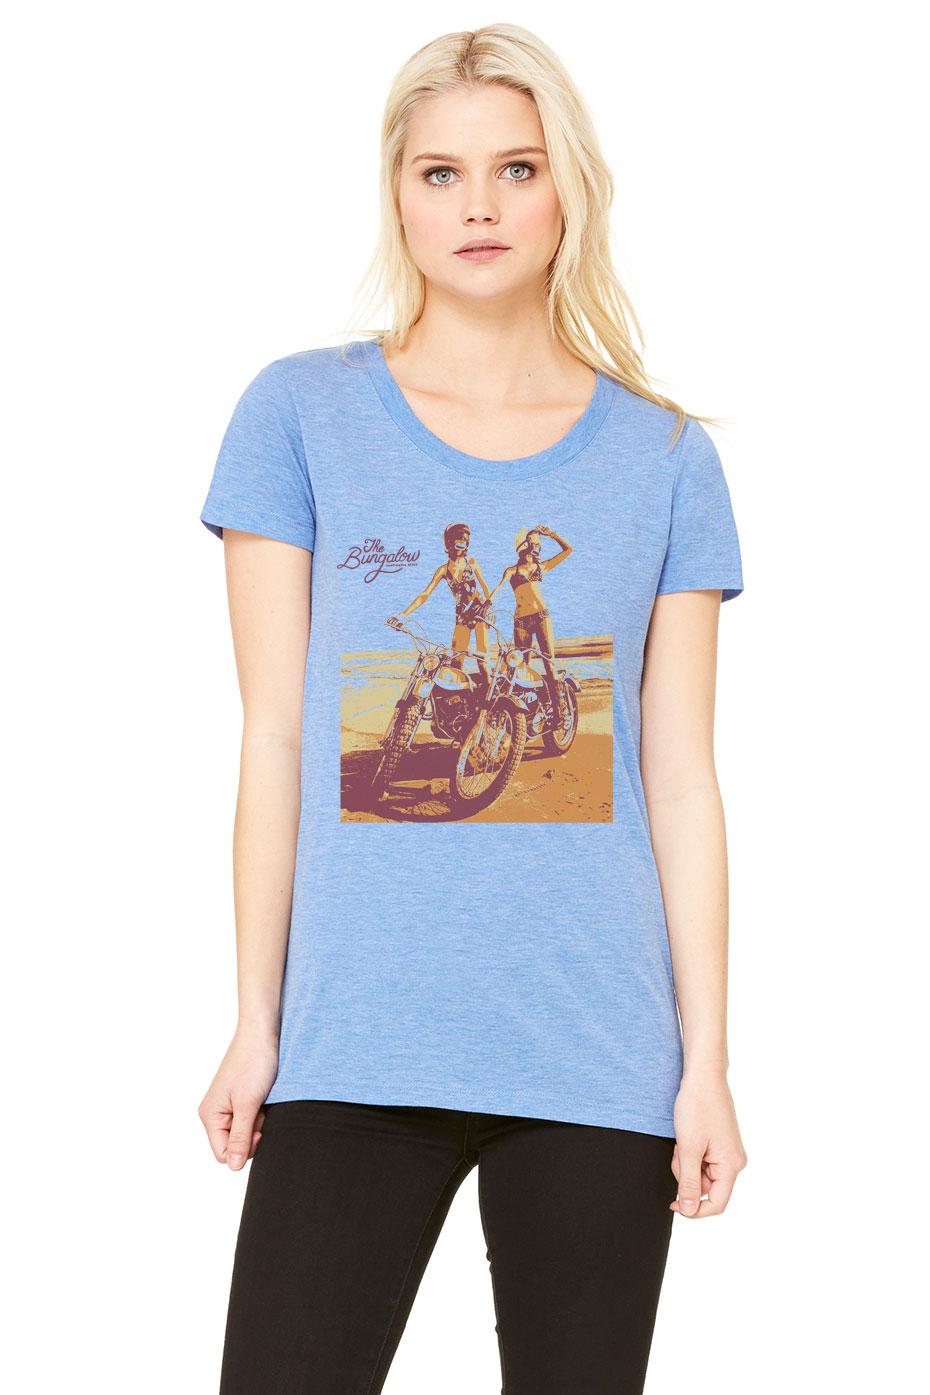 MOTO GIRLS BLUE TRIBLEND